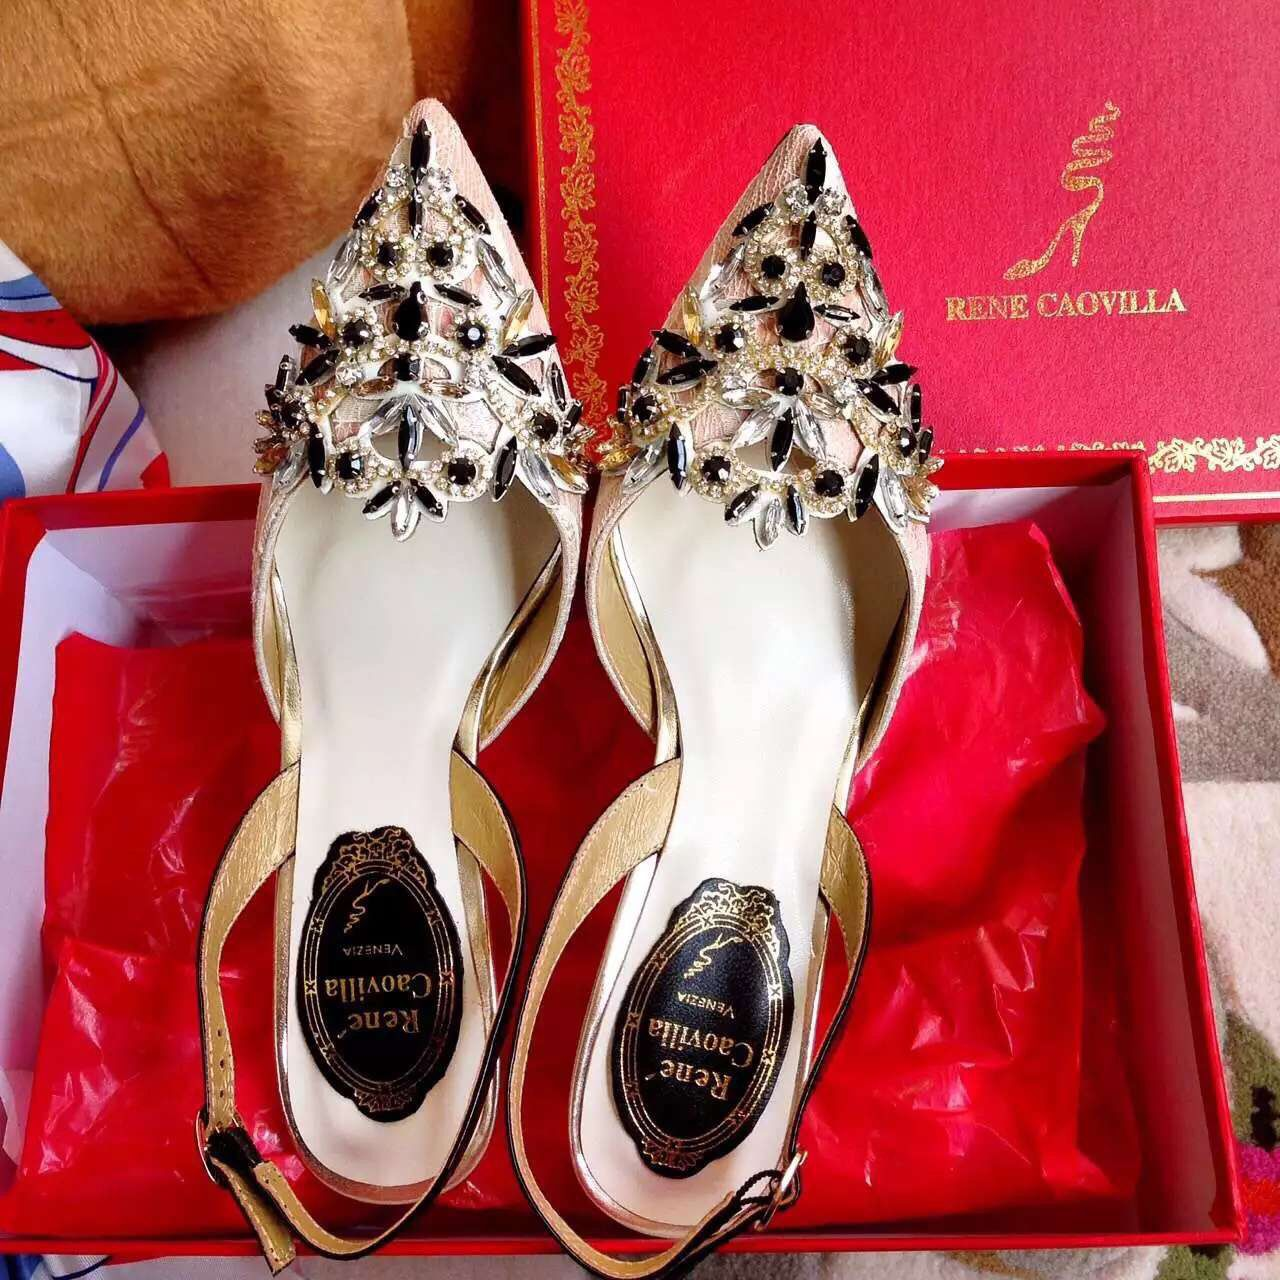 Abudhabi Qatar Doha Bahrain Saudi Trends Jeddah Kuwait Saudiarabia Love Luxury Usa Chanel Louisvuitton Parda Gucci Her Shopping Chanel Handbag Shoes Valentino